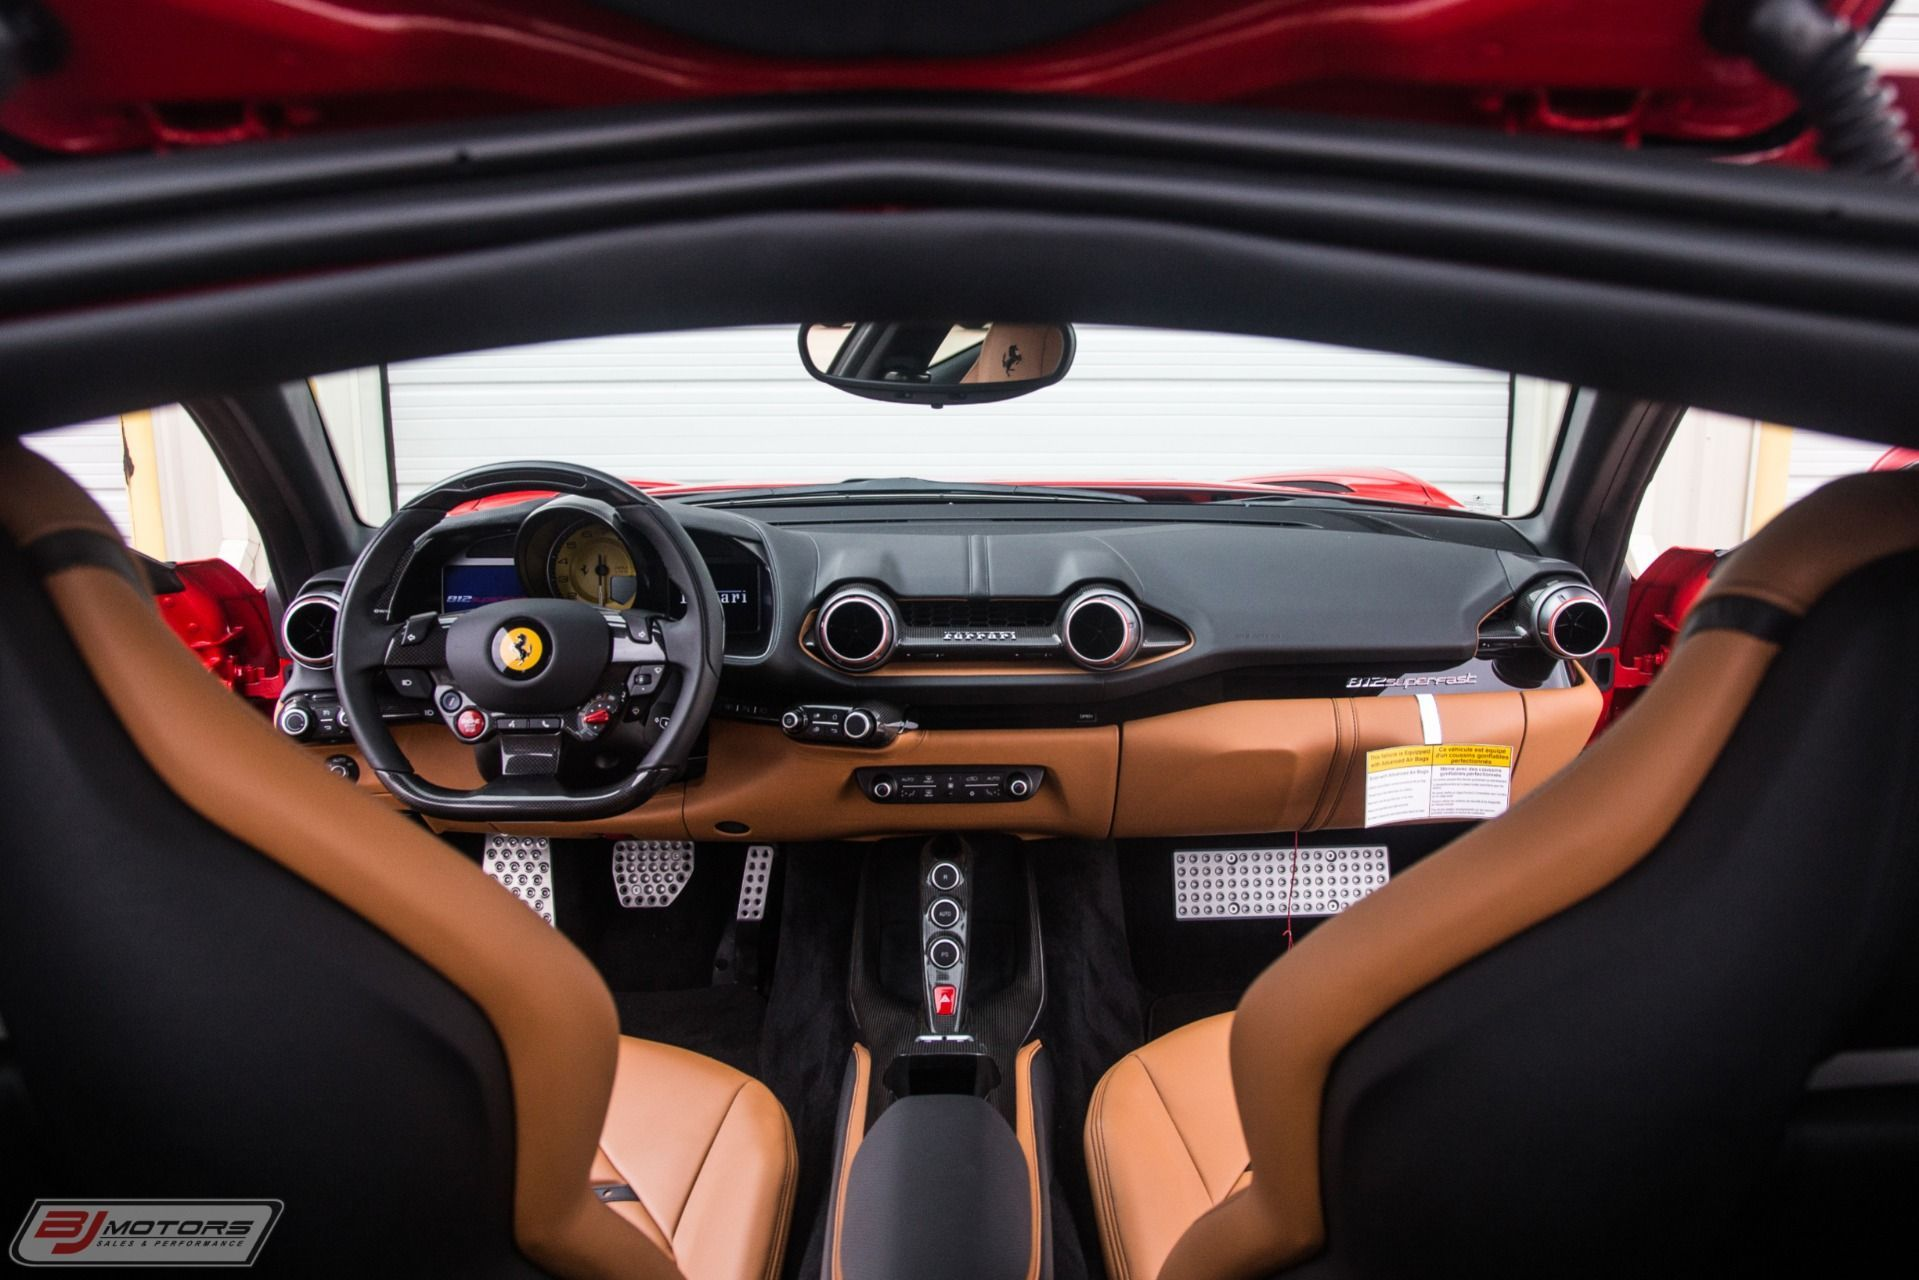 Best 2019 Ferrari 812 Superfast Wallpaper With Images Ferrari